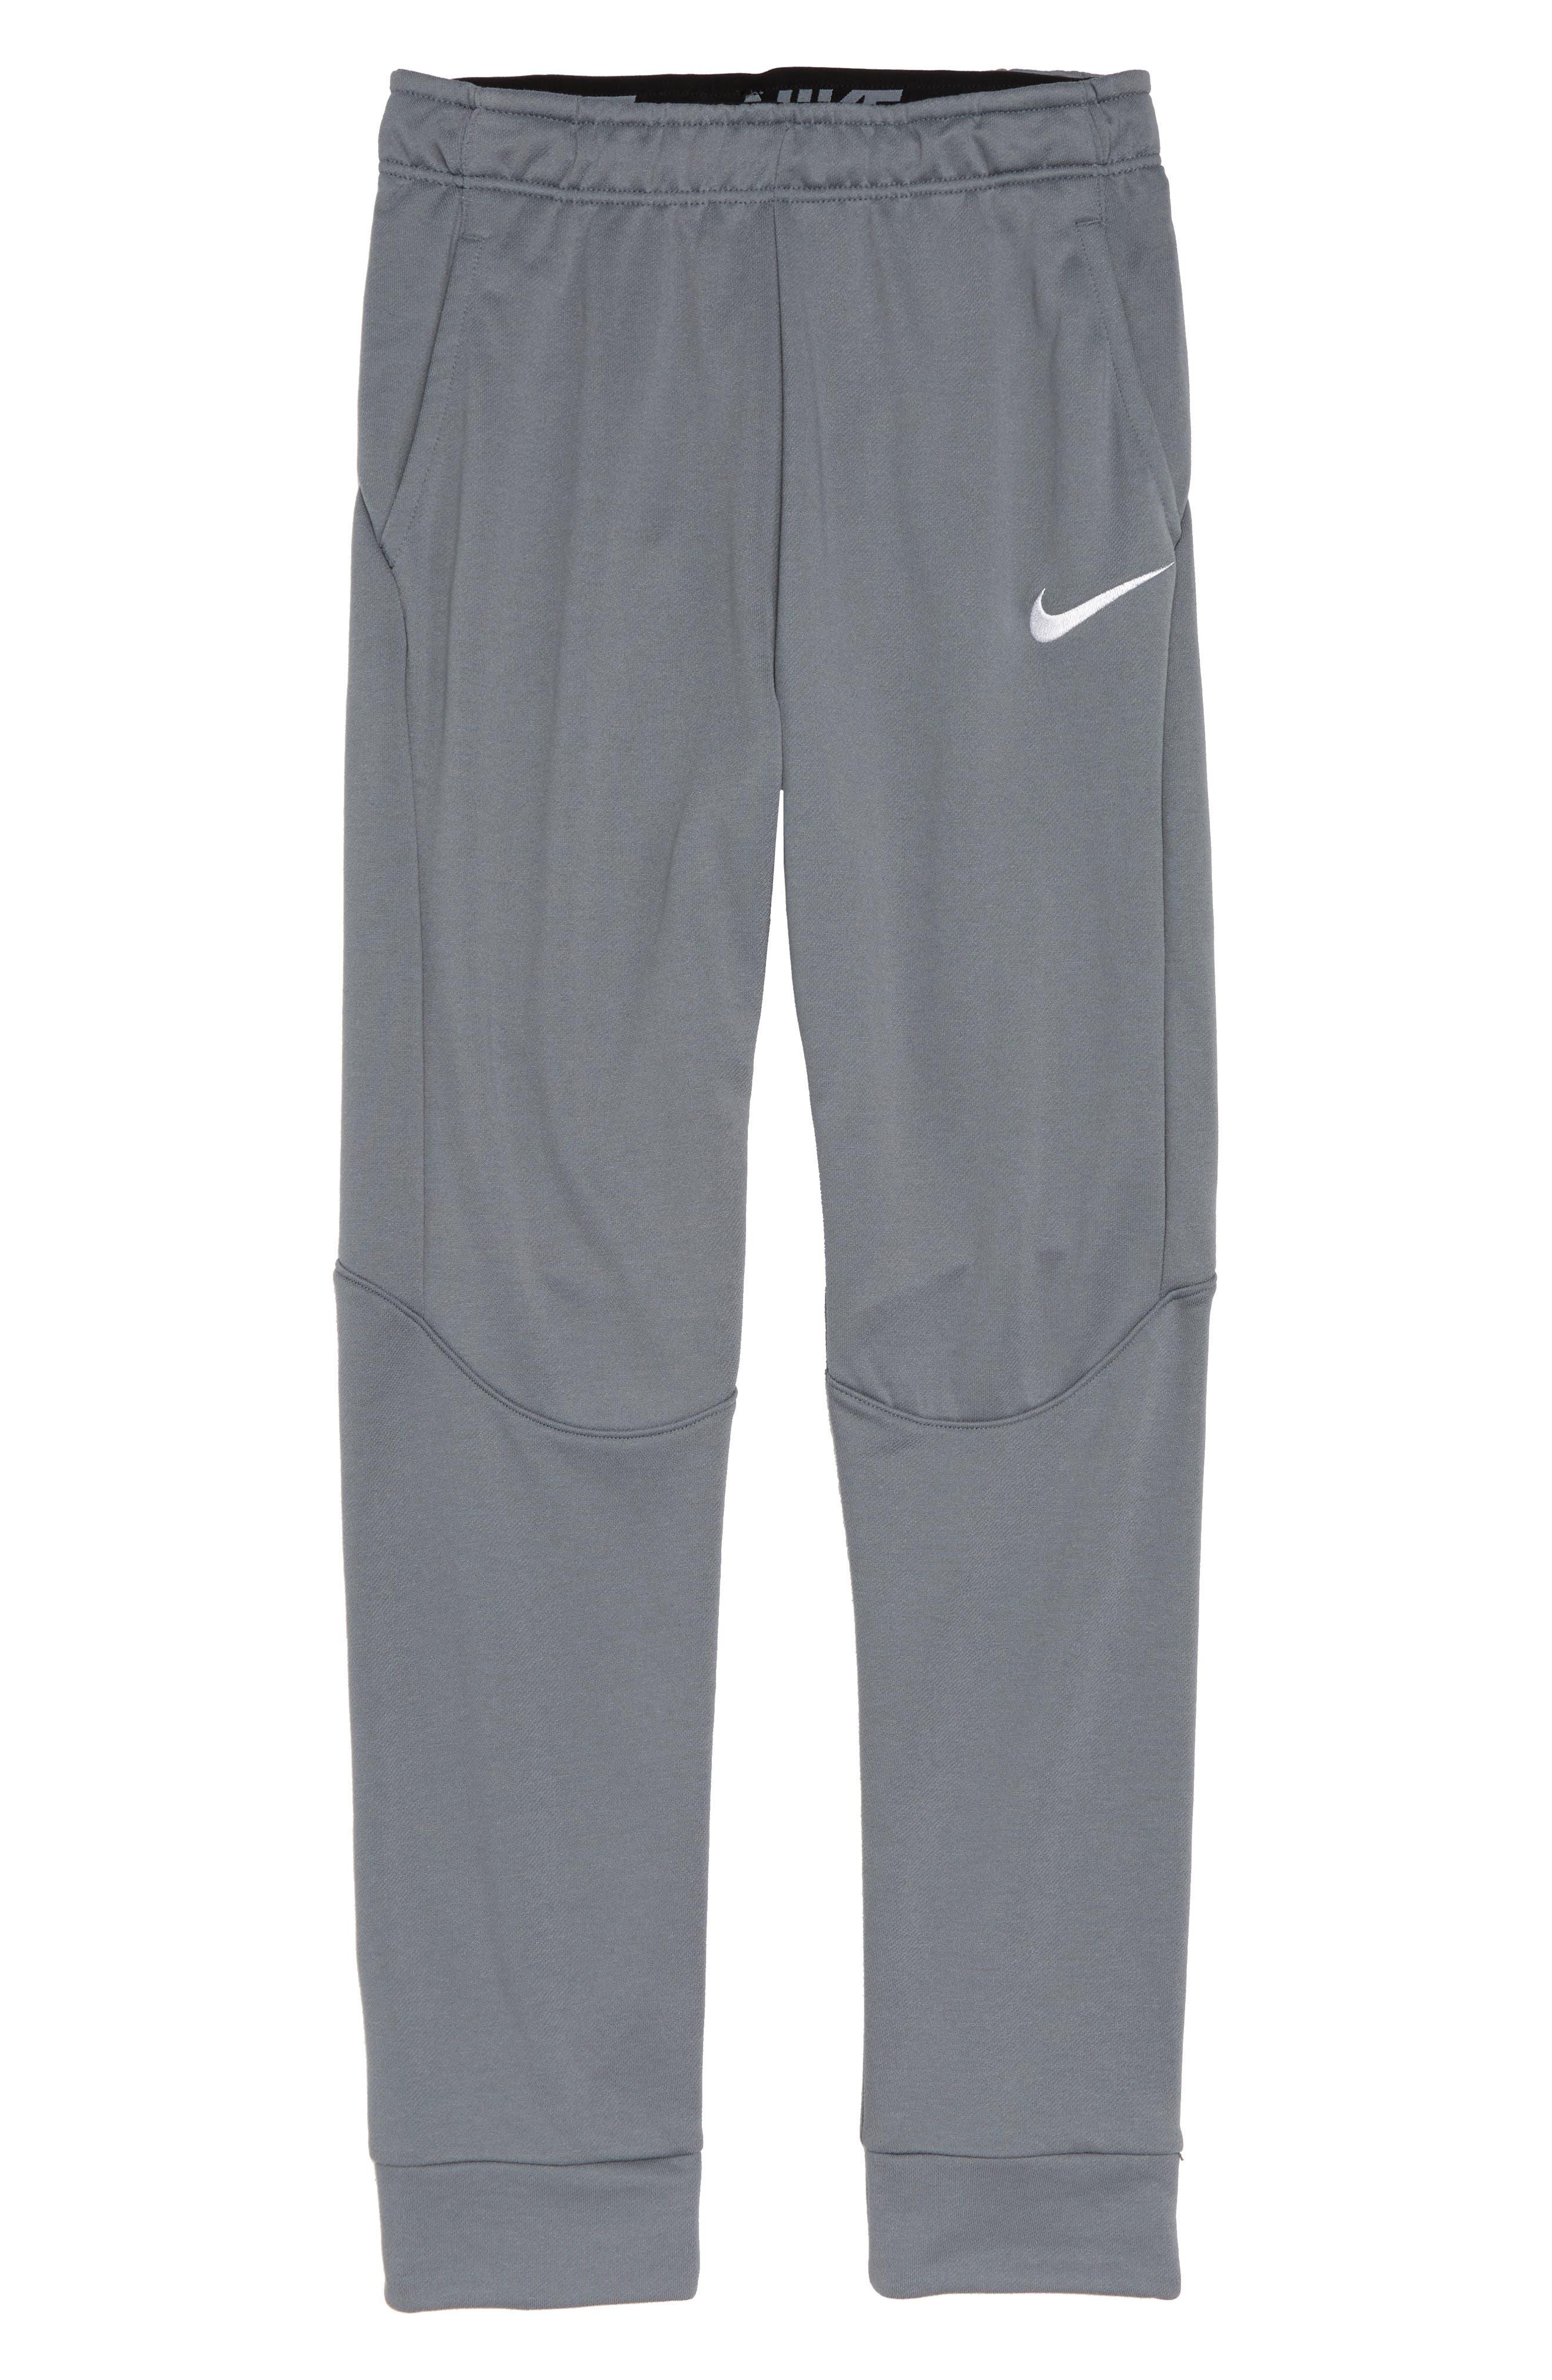 NIKE Dry Fleece Training Pants, Main, color, COOL GREY/ WHITE